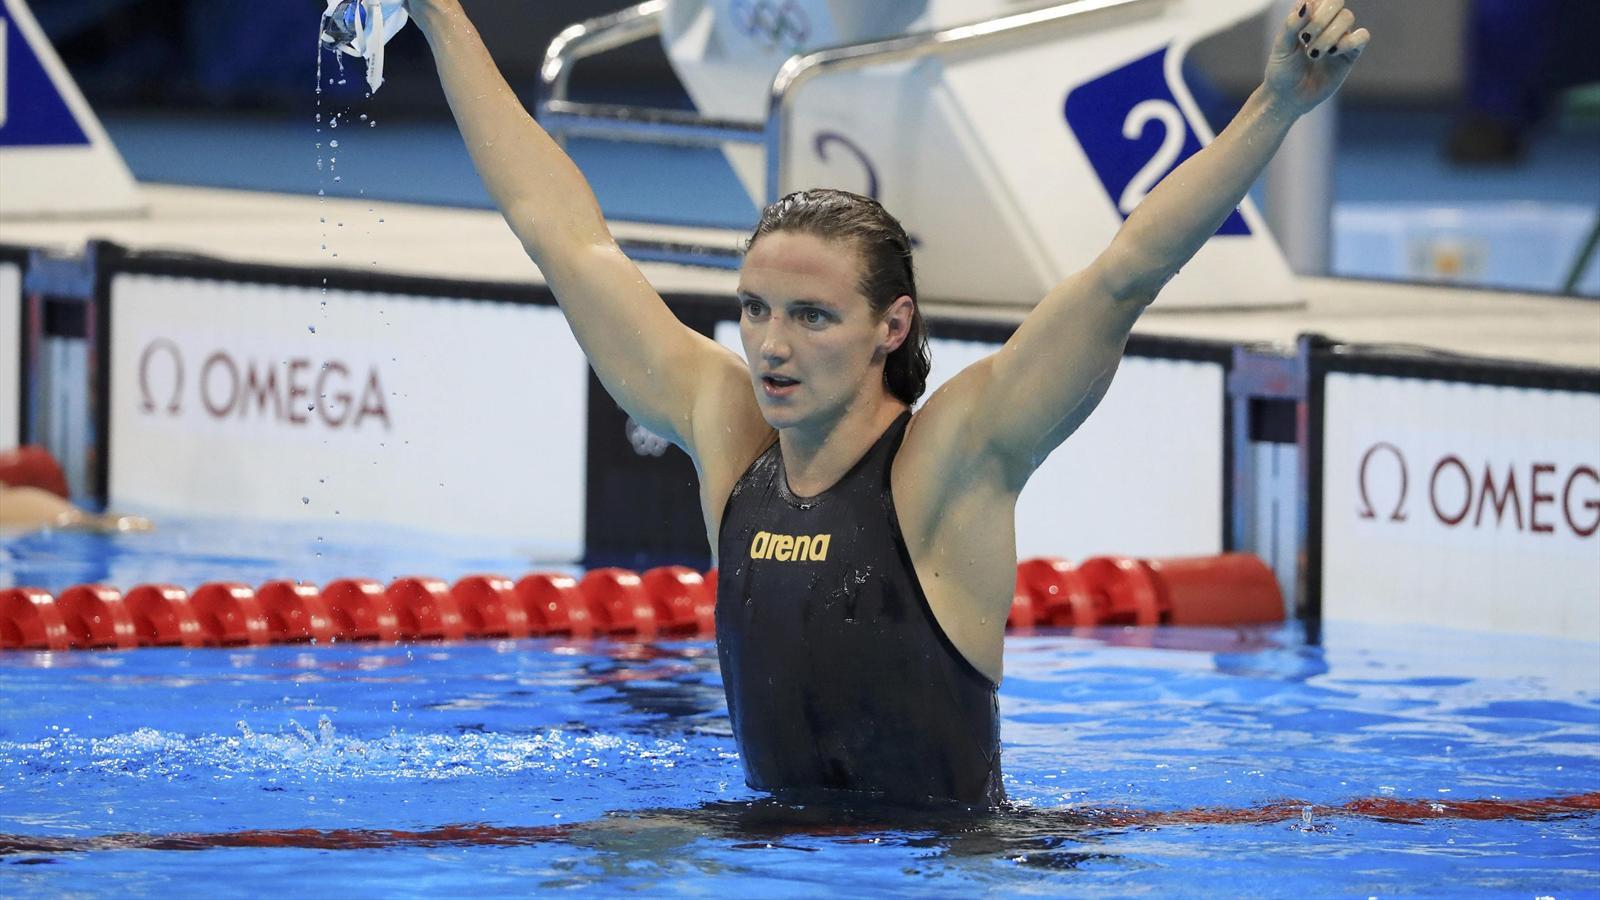 Olympics Rio 2016: Katinka Hosszu destroys women's 400m individual medley world record in style ...